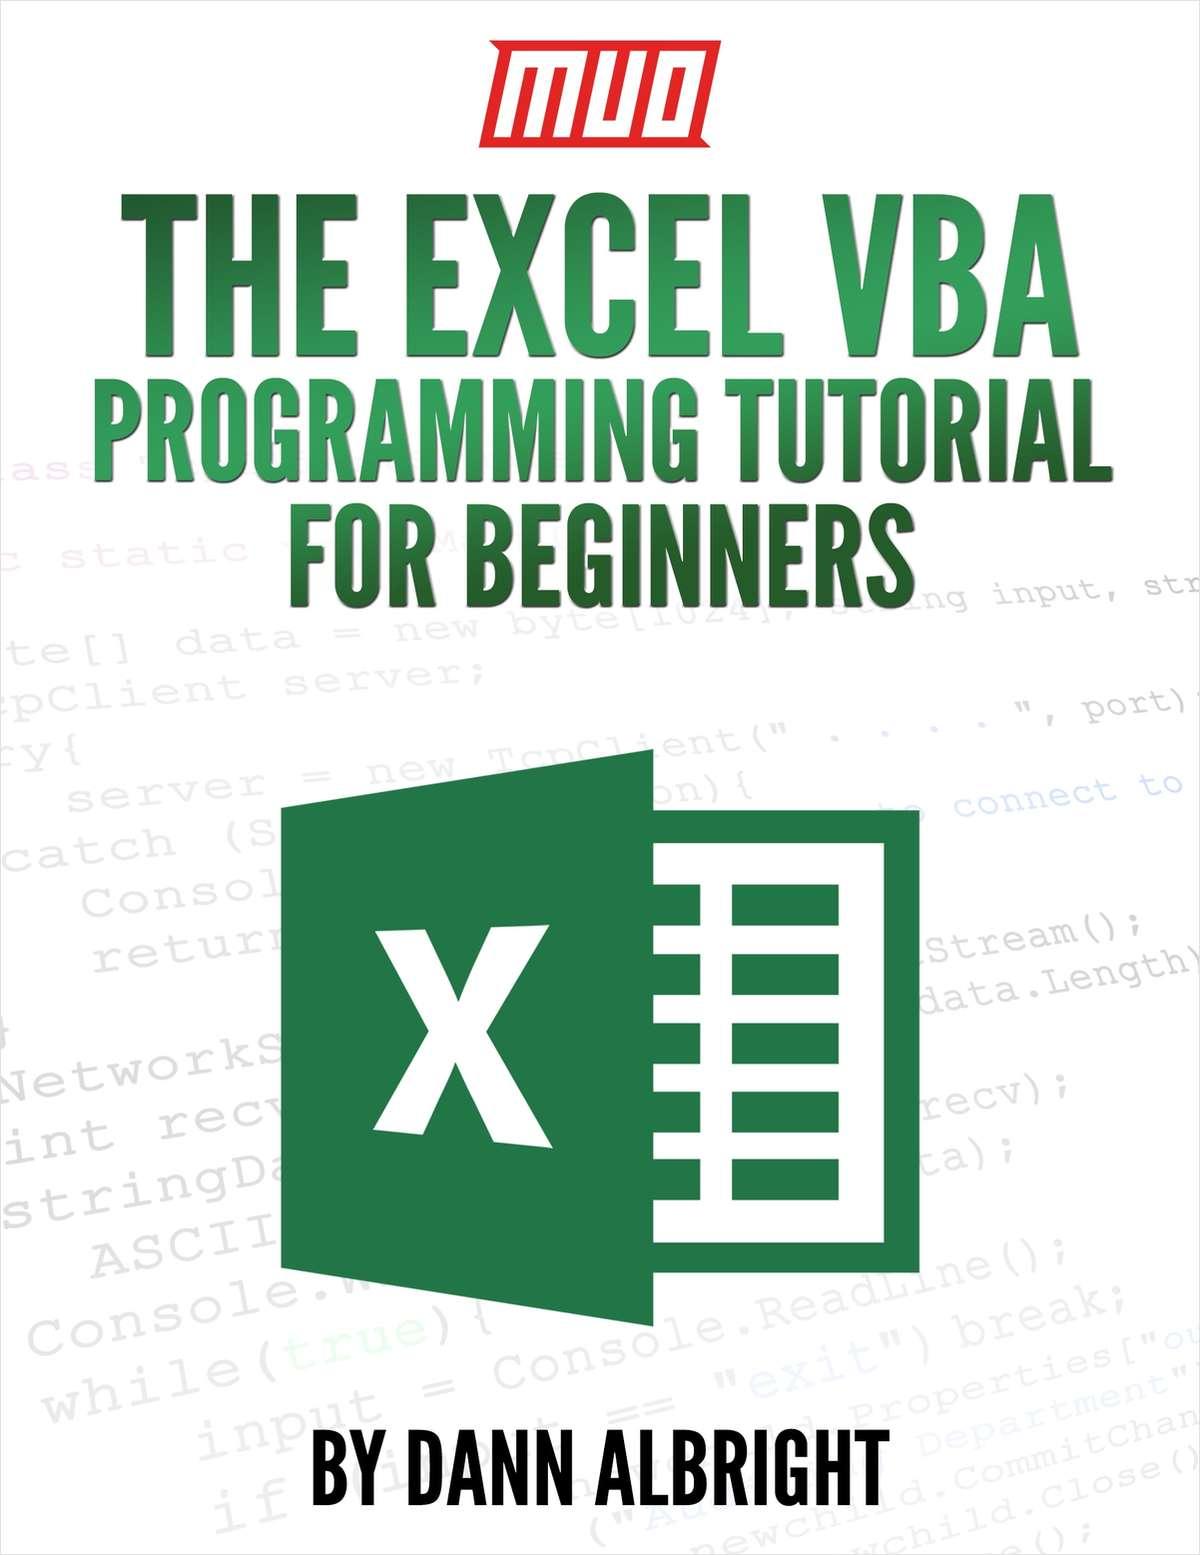 The Excel VBA Programming Tutorial for Beginners